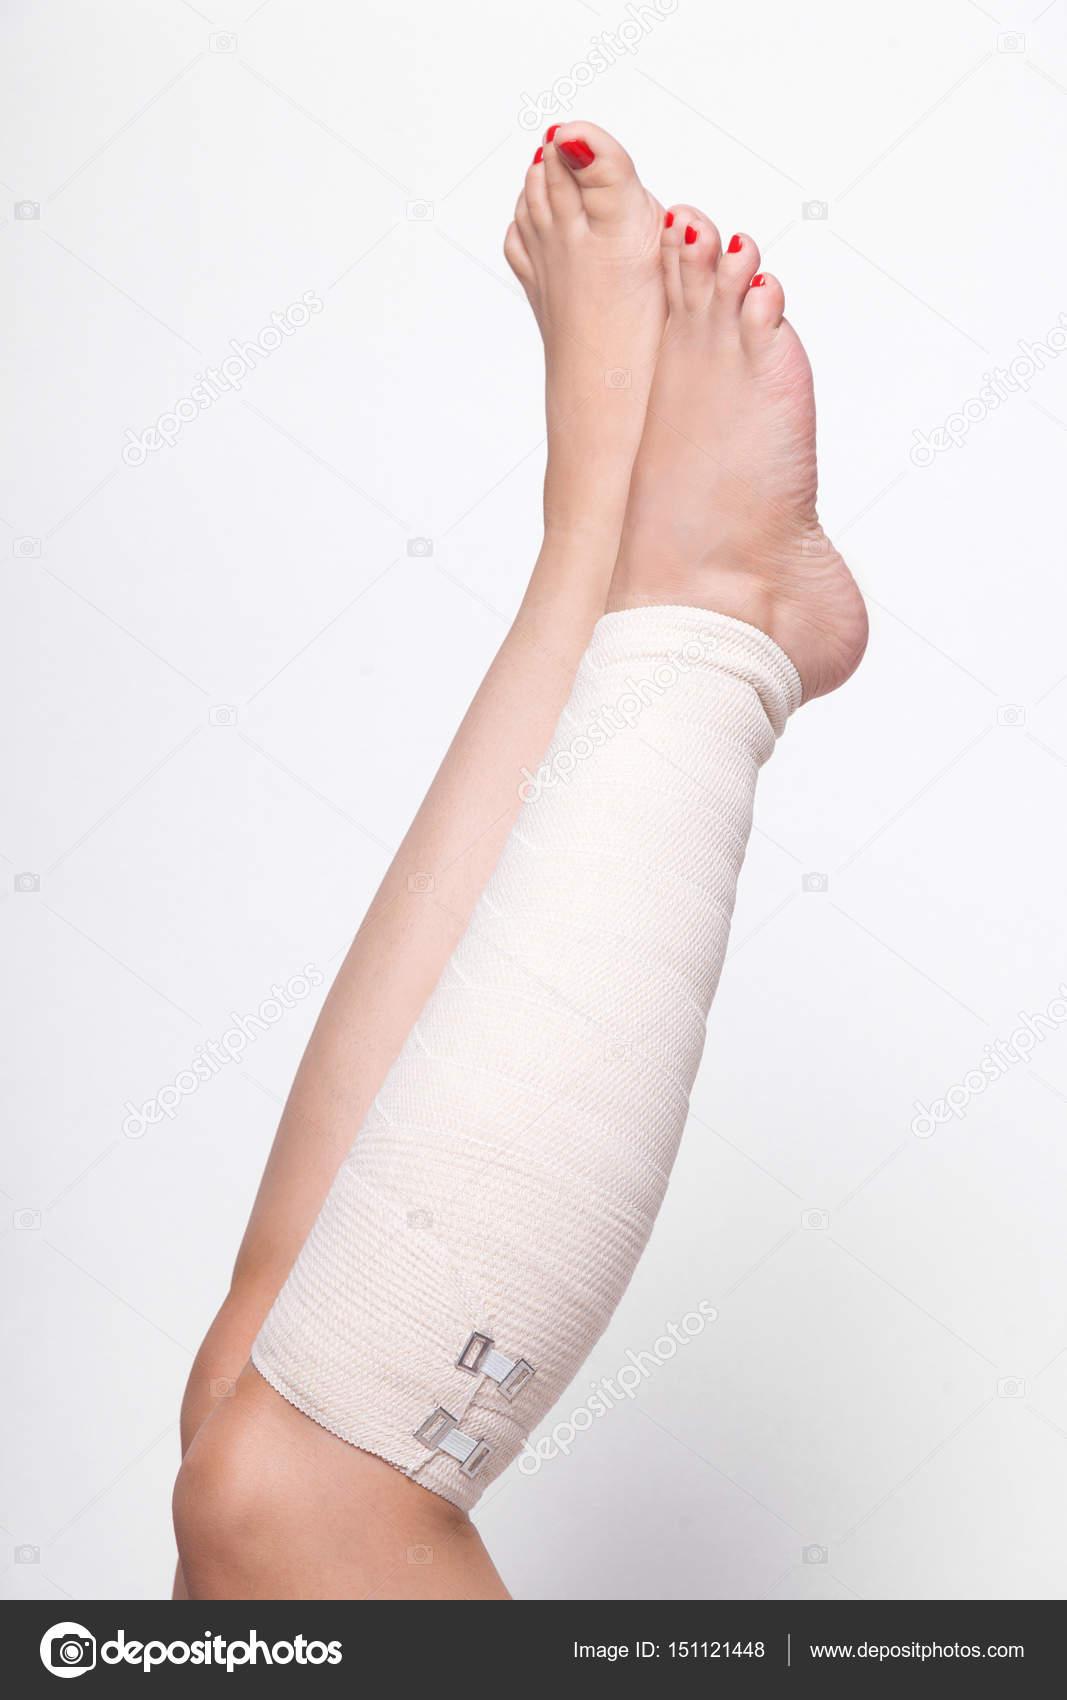 elastisk binda fot